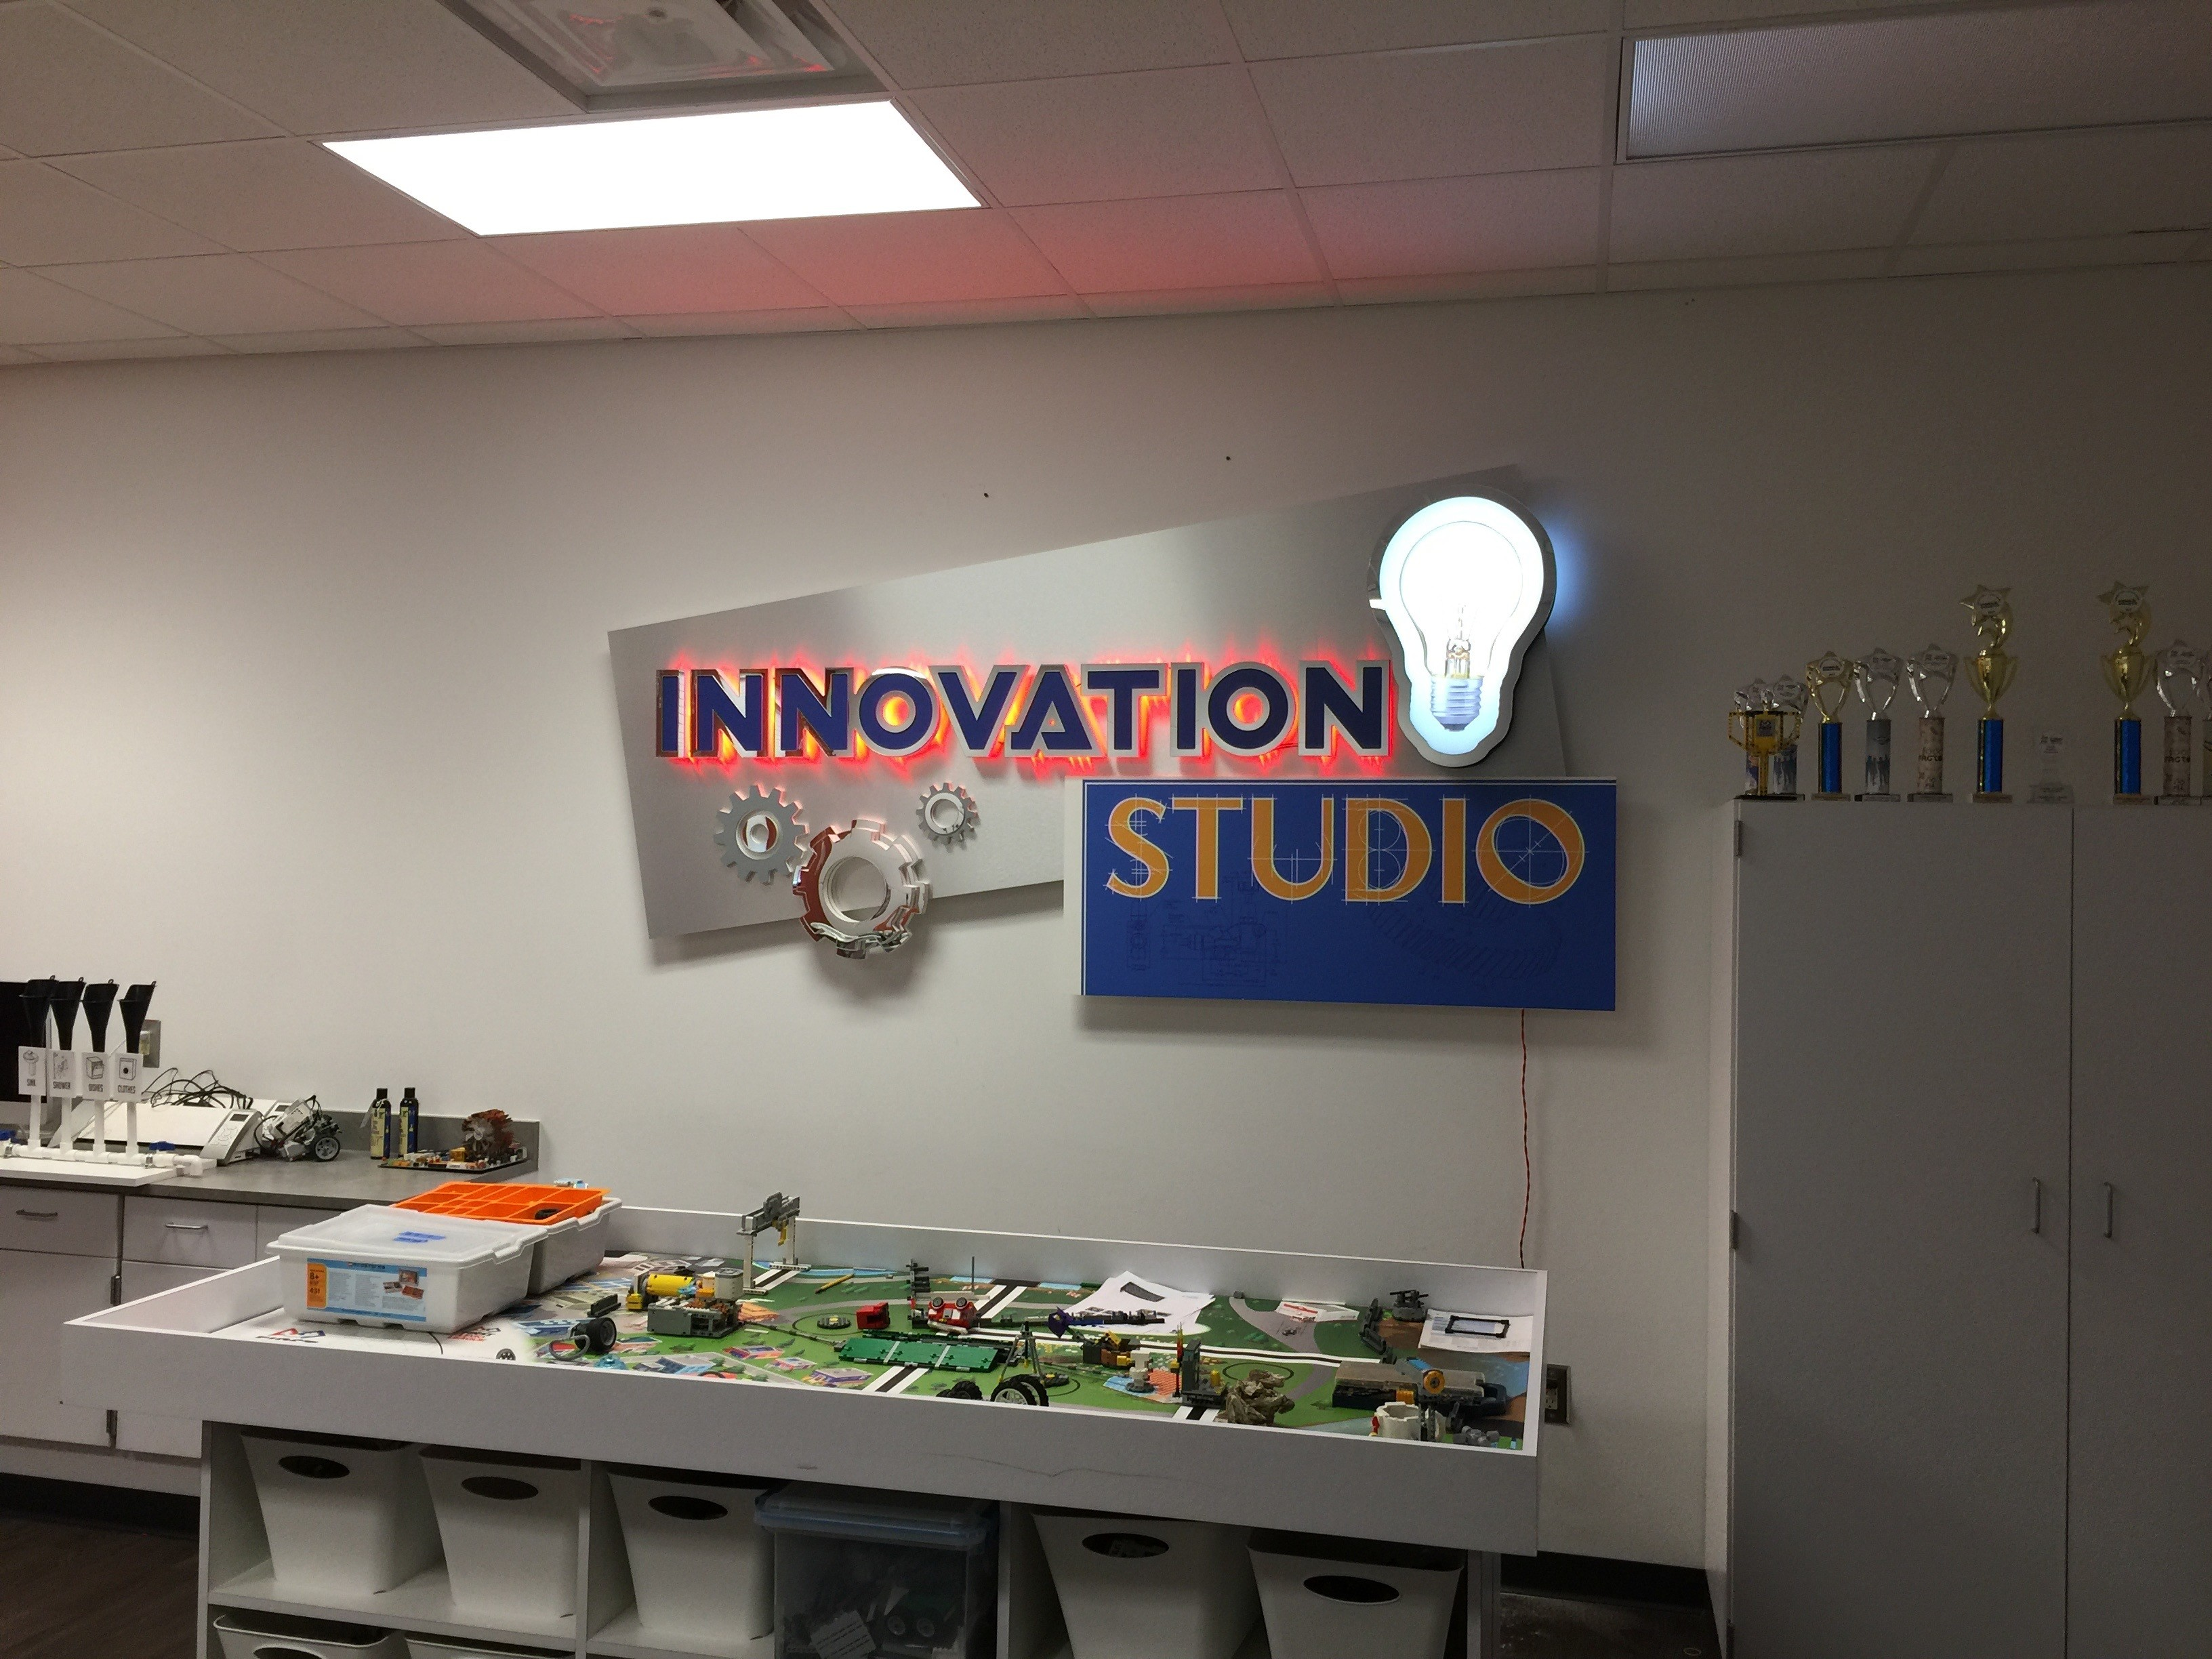 Lakeview Robotics Innovation Studio Sign ON